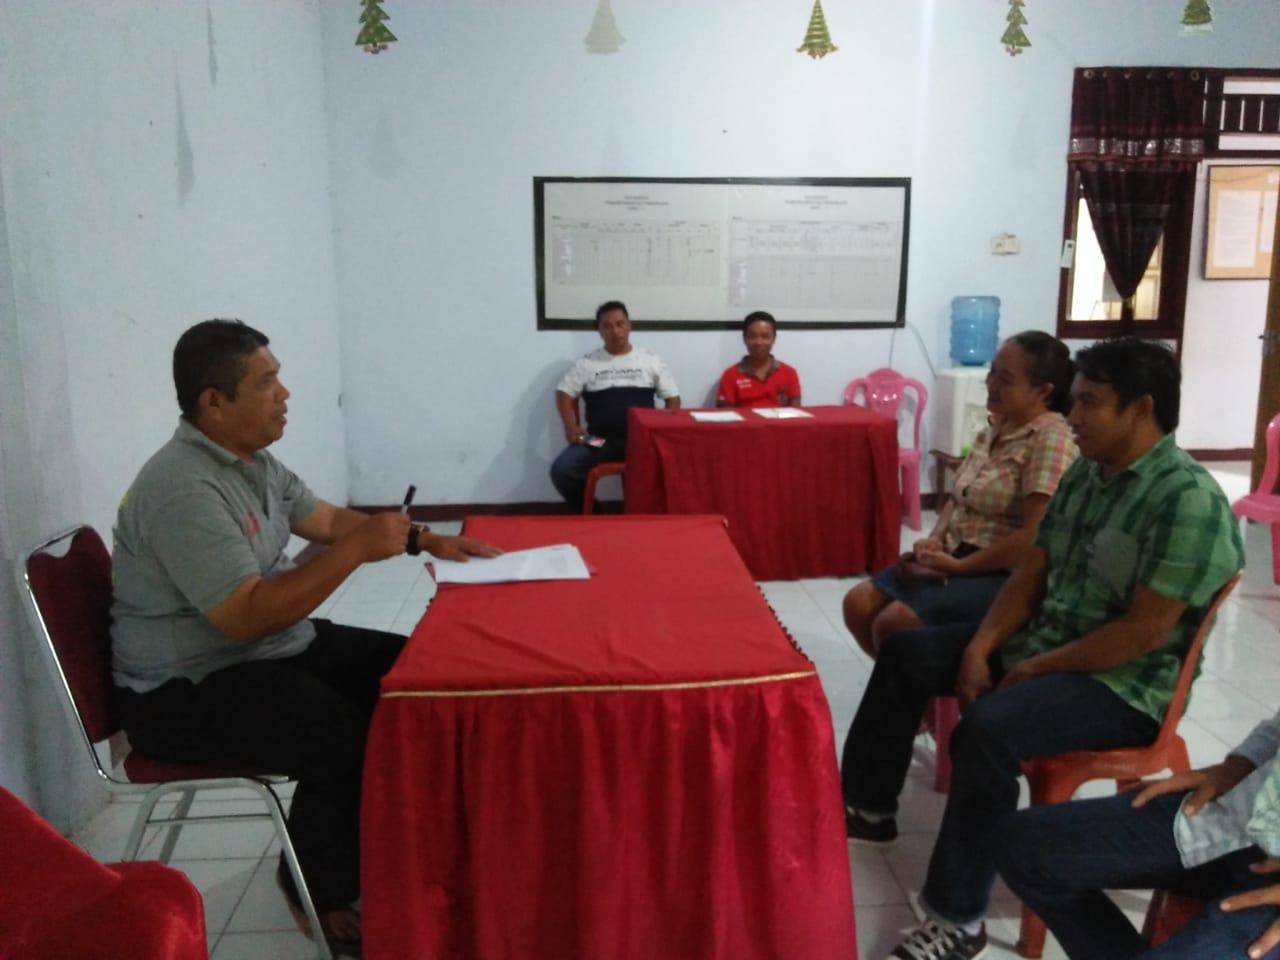 Rekrut perangkat kampung, Kapitalau Bandil libatkan pemerintah kecamatan